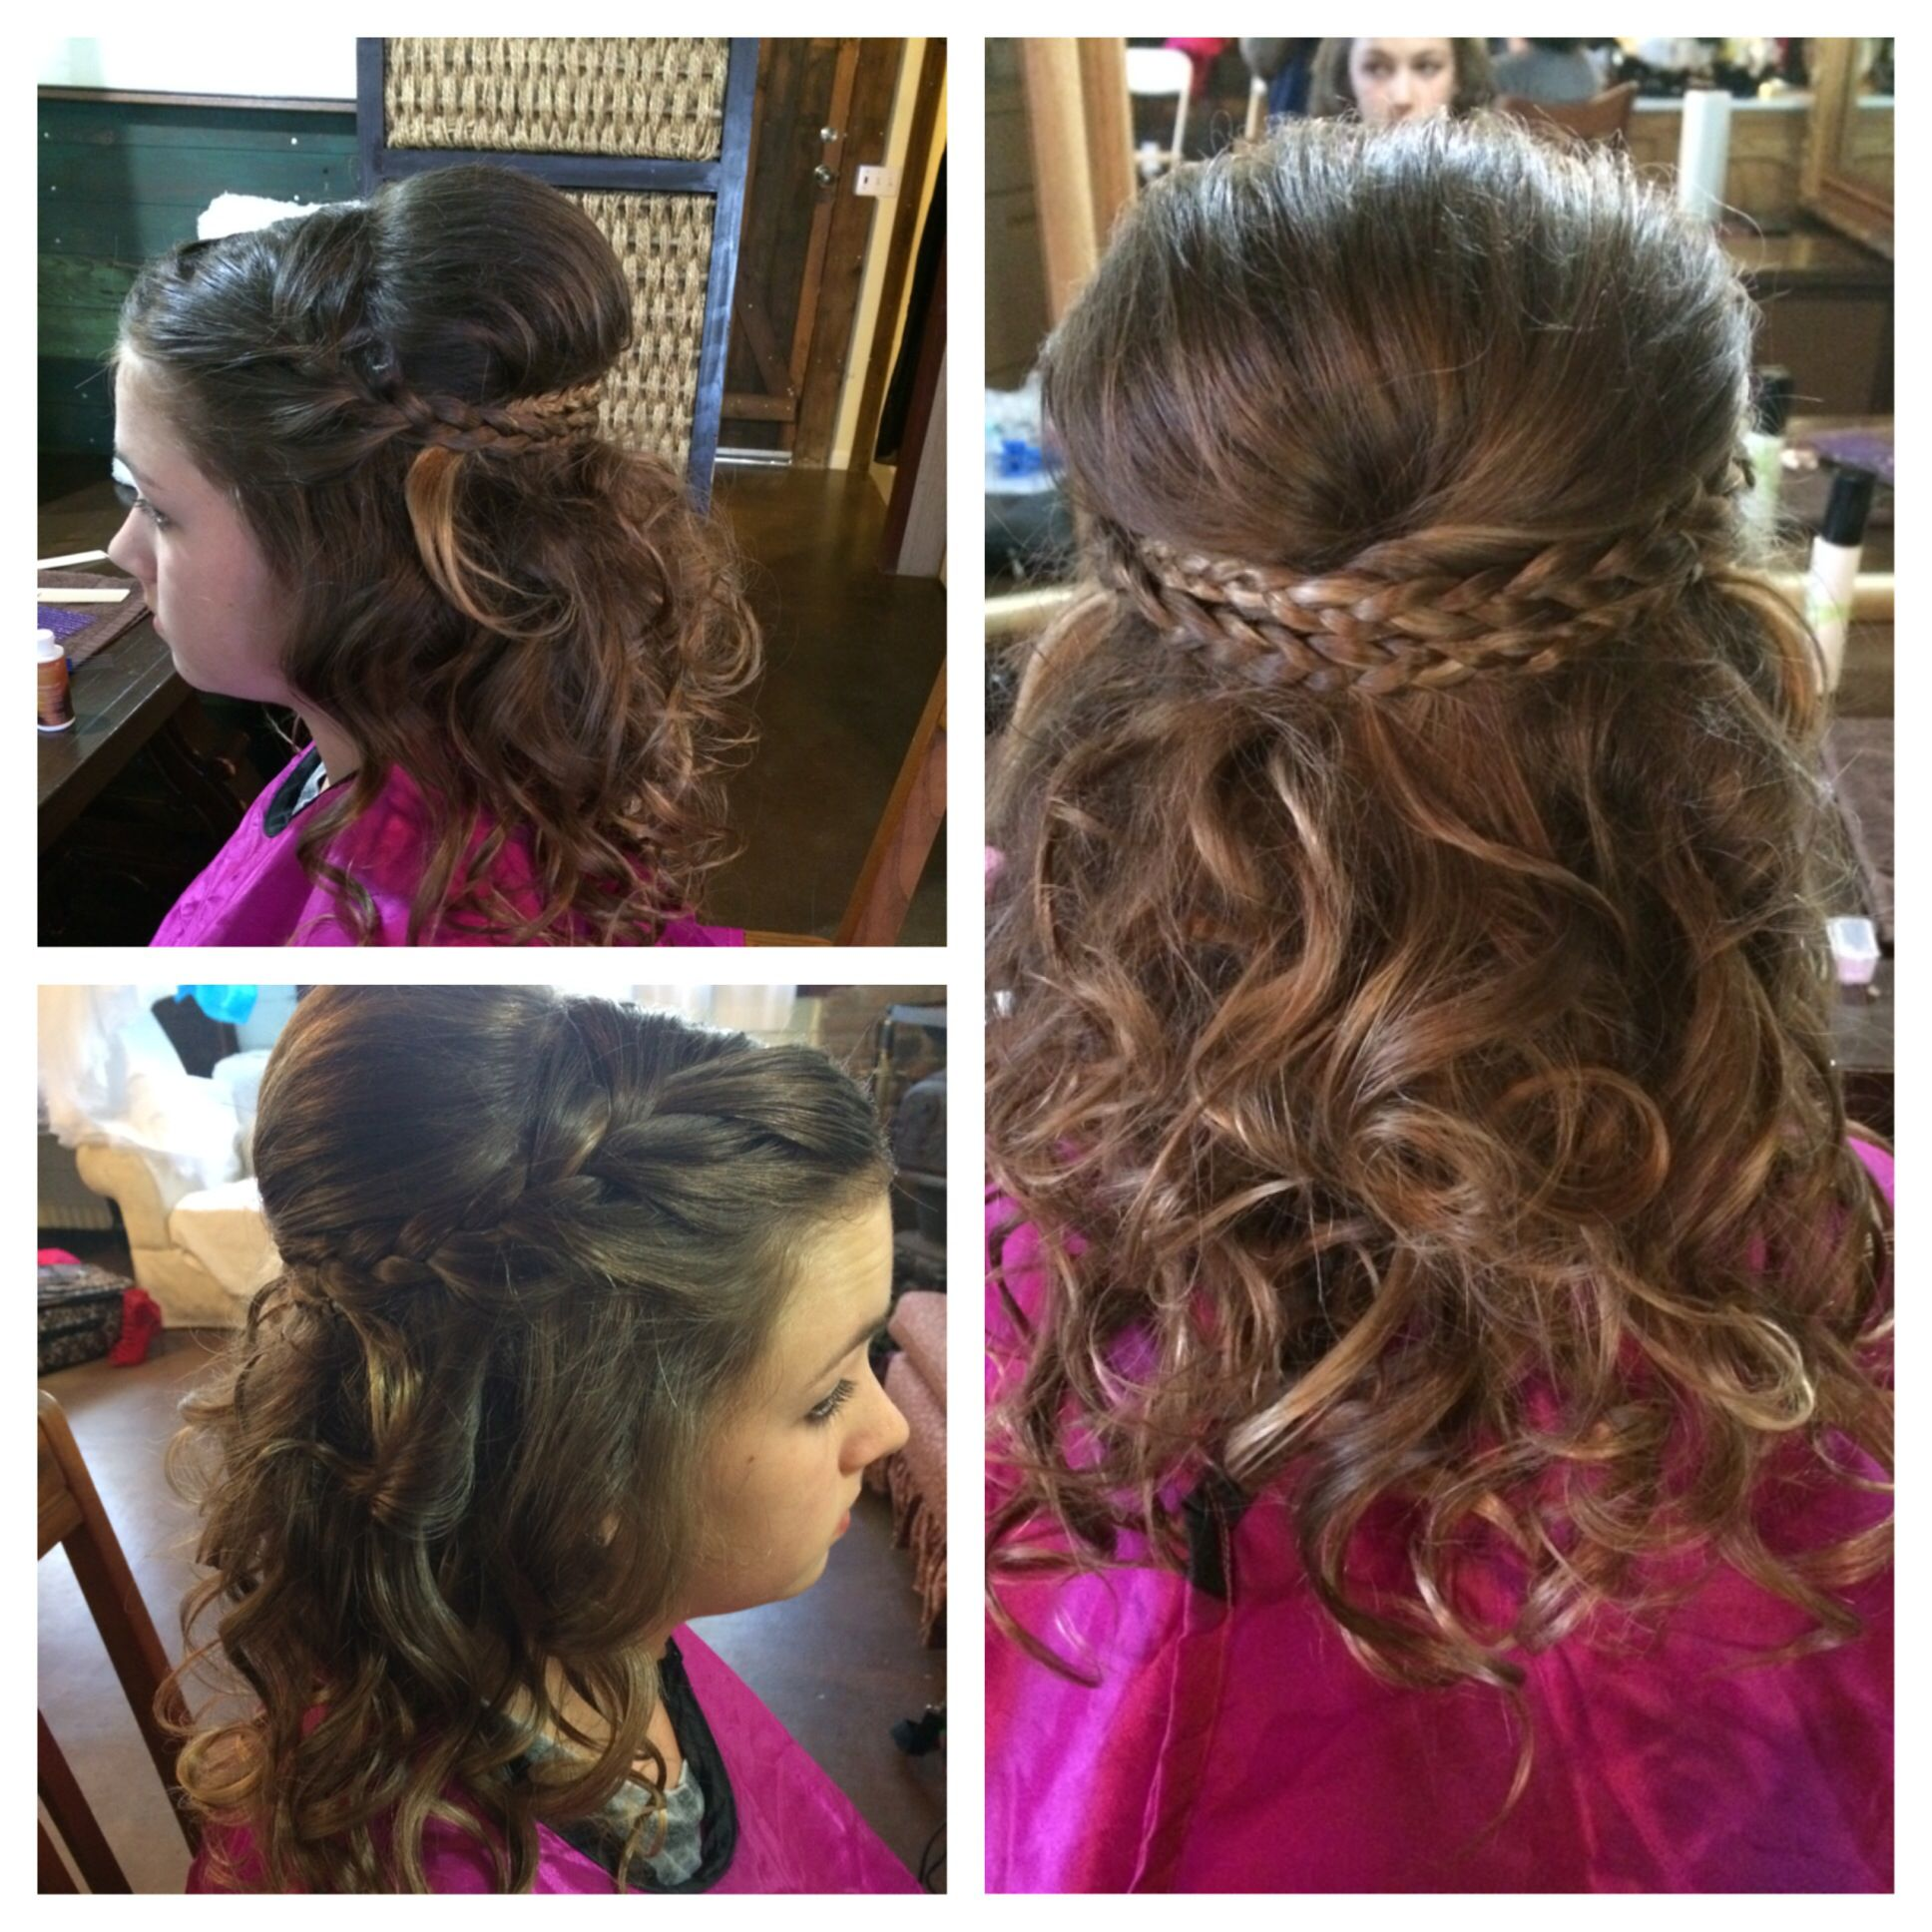 Wedding Hairstyles For Jr Bridesmaids: Junior Bridesmaid Hair. Wedding Hair. Bridesmaid. Cute